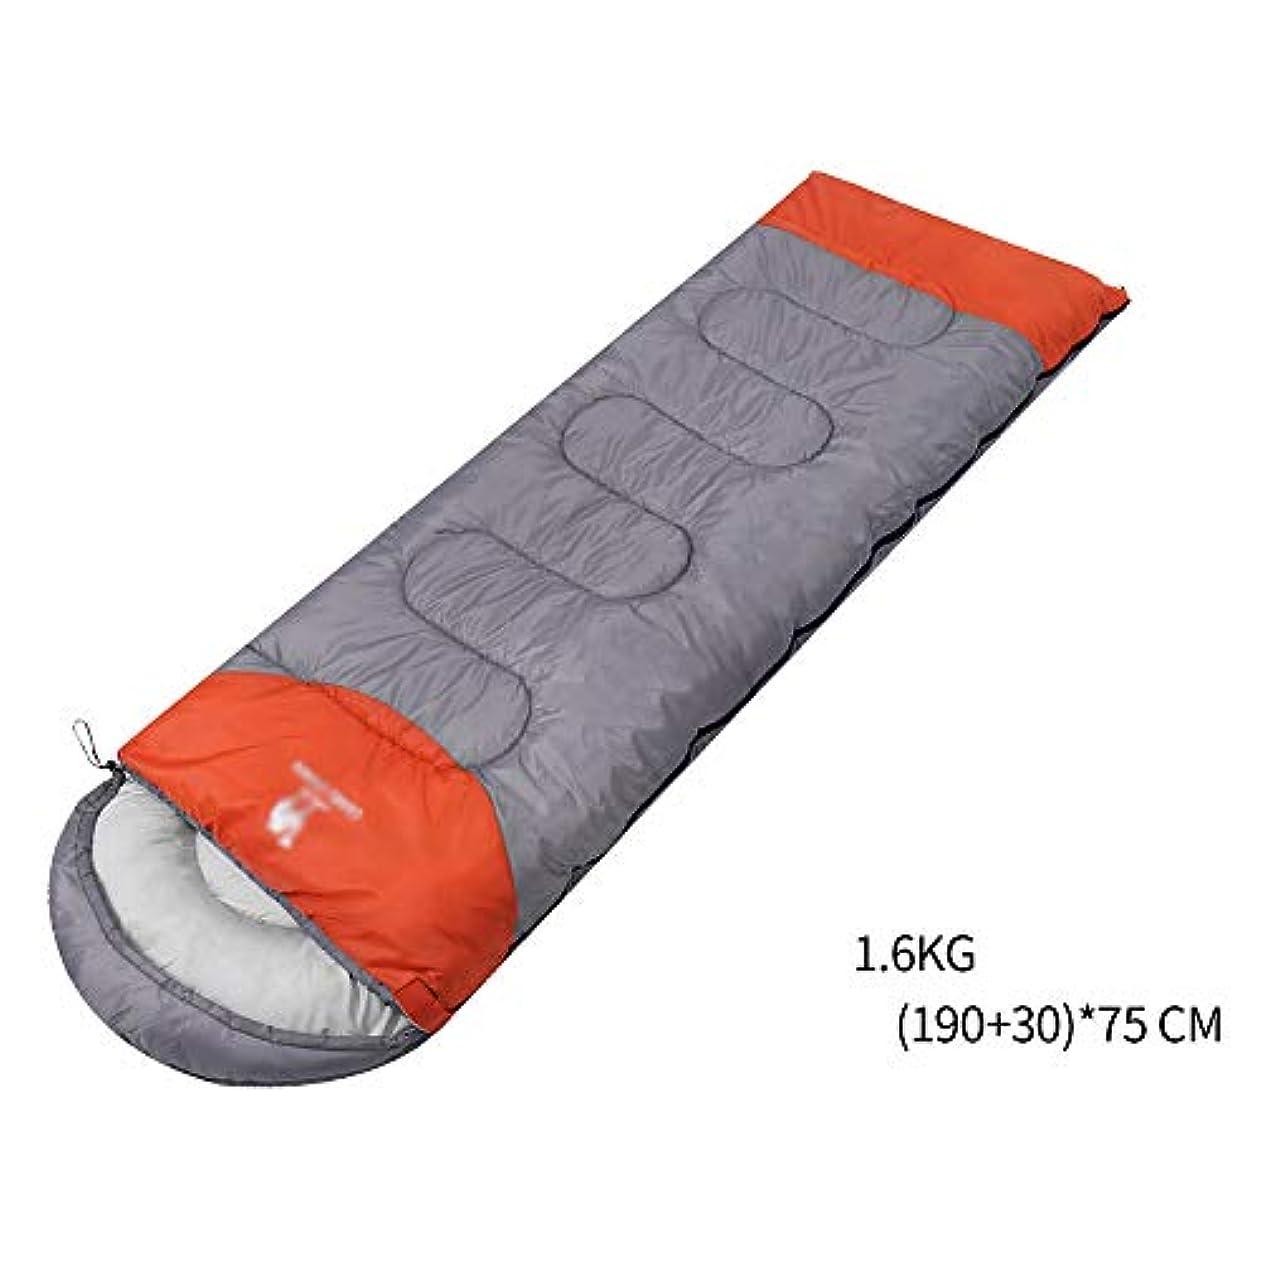 寝袋夏寝袋封筒型寝袋大人寝袋封筒キャンプ寝袋軽量ポータブル屋外装備登山キャンプ防災夜通し